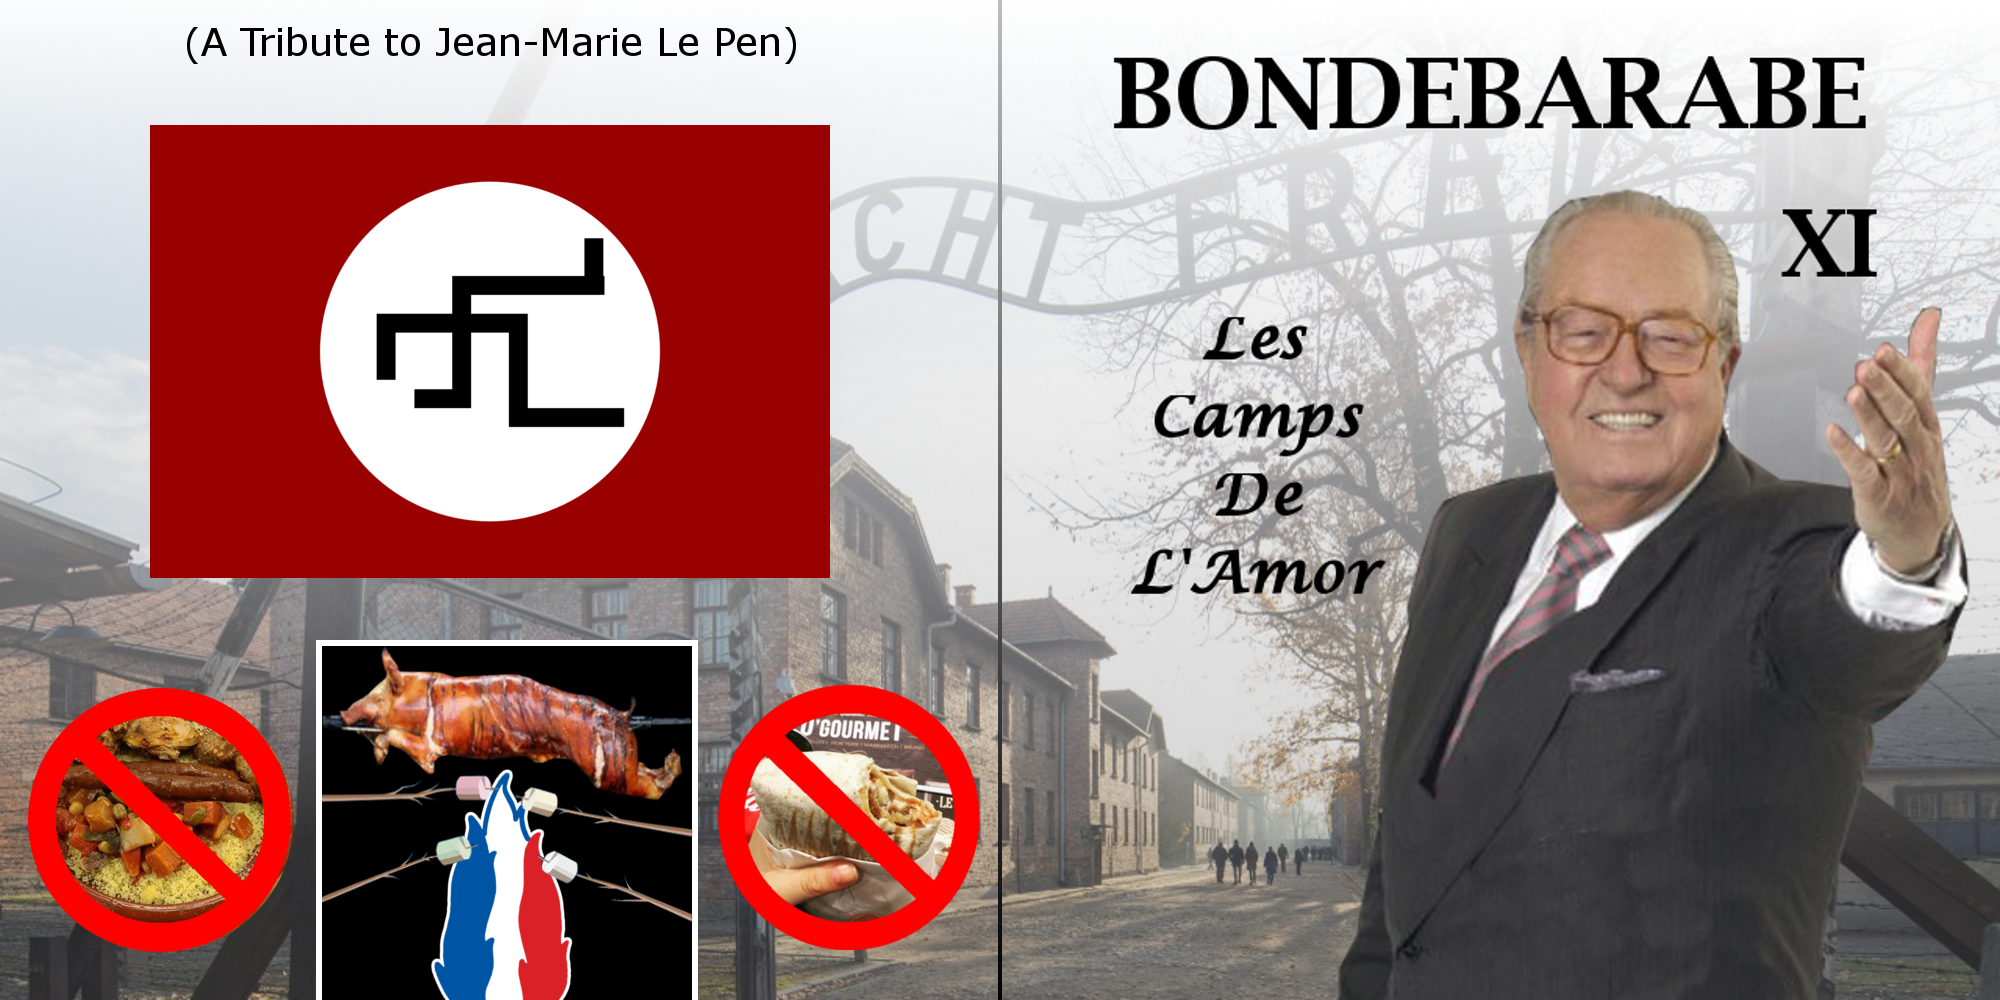 Bondebarabe_11_Le_Pen.png